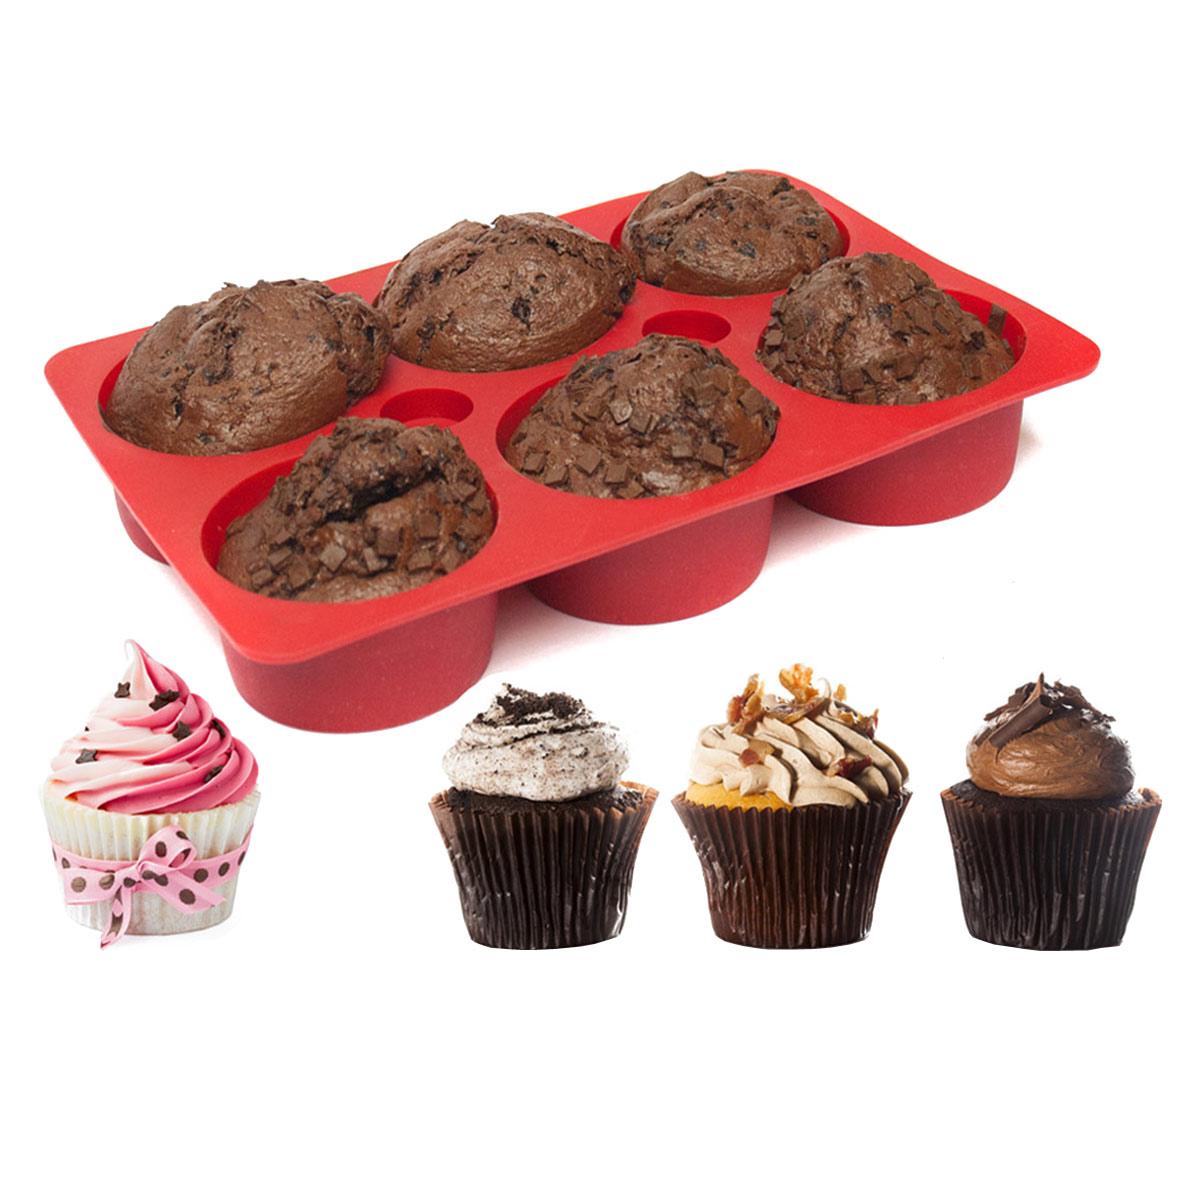 silikonform f r muffins cupcakes mit f llung backform aus silikon muffinform ebay. Black Bedroom Furniture Sets. Home Design Ideas